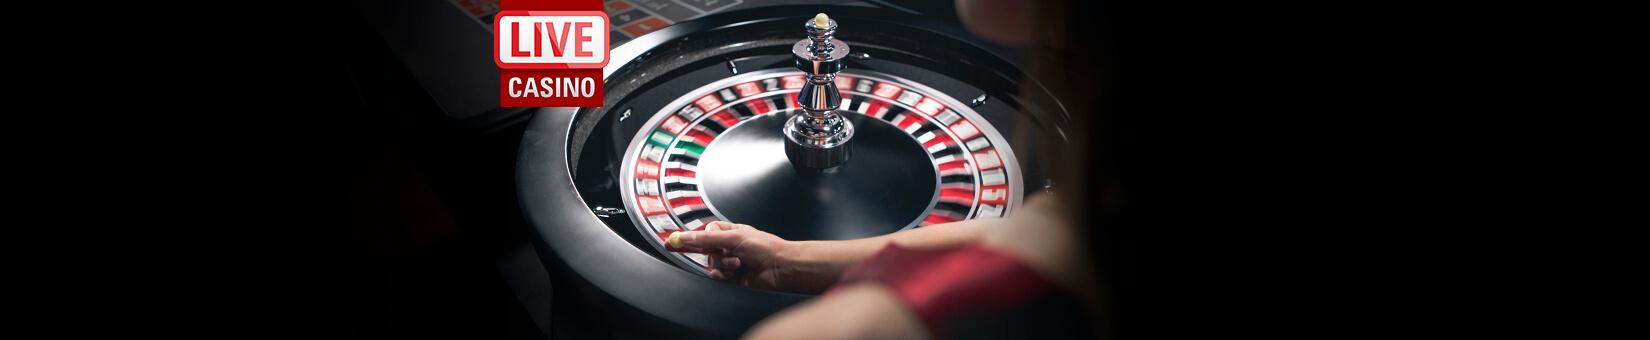 Juegos LuckyCreek com casino en vivo pokerstars-628445